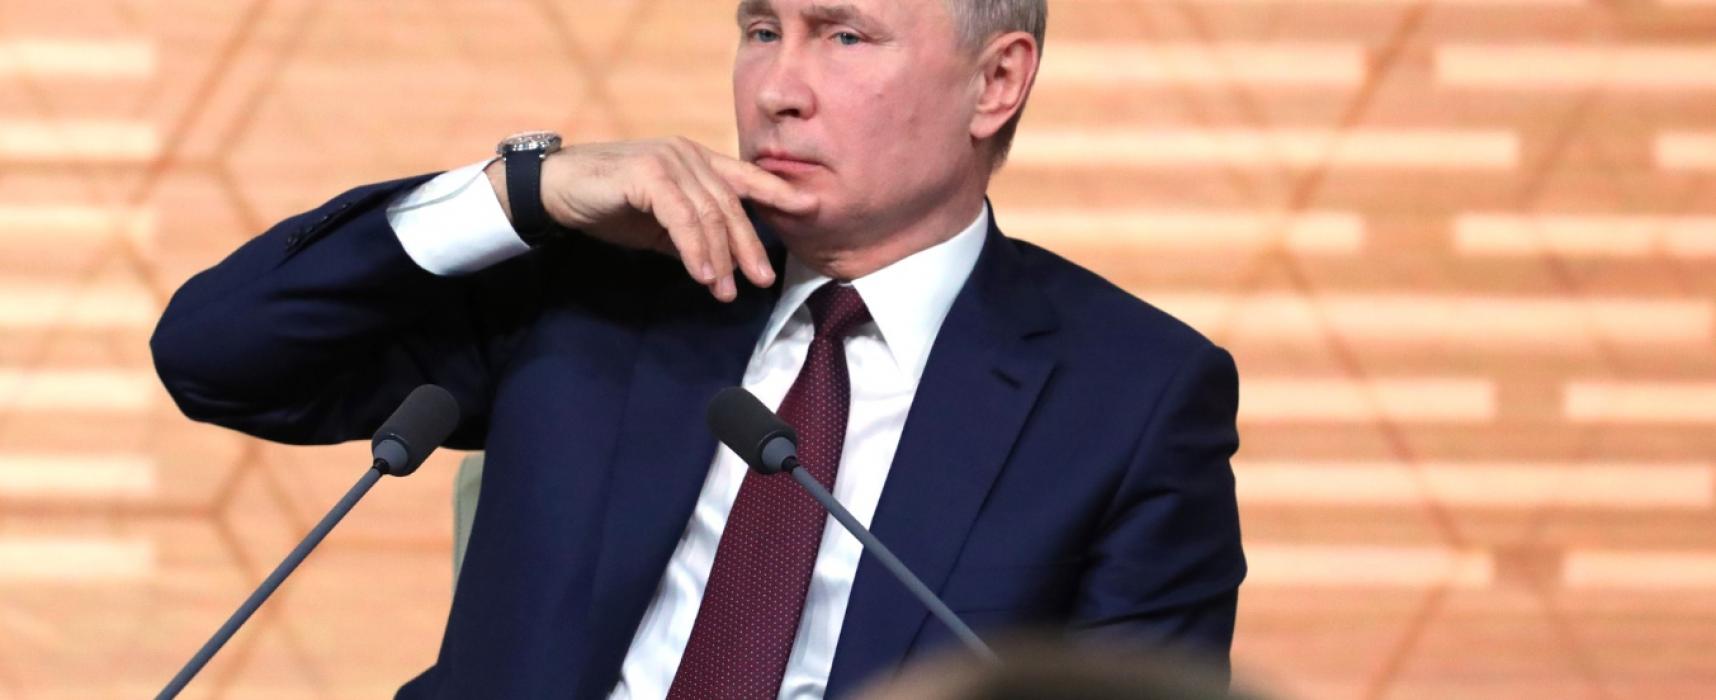 ¿Se puede confiar en lo que Putin dice sobre Ucrania? Fact-checking